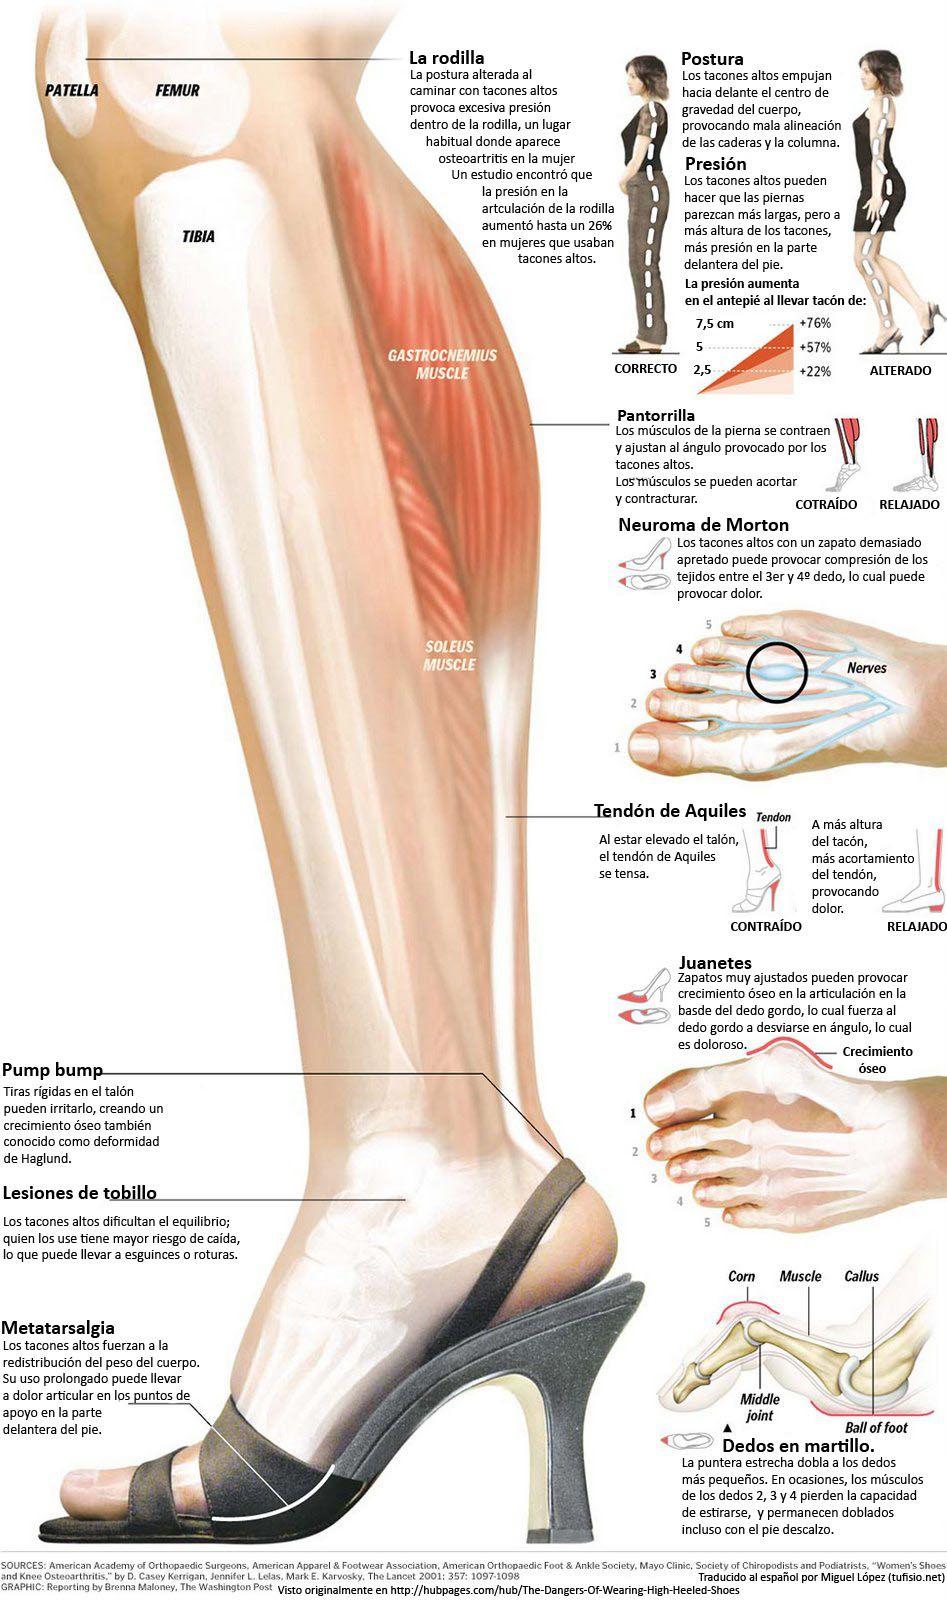 Blog de Fisioterapia, Fissioterapia, Biomecánica, Anatomía, Músculos ...